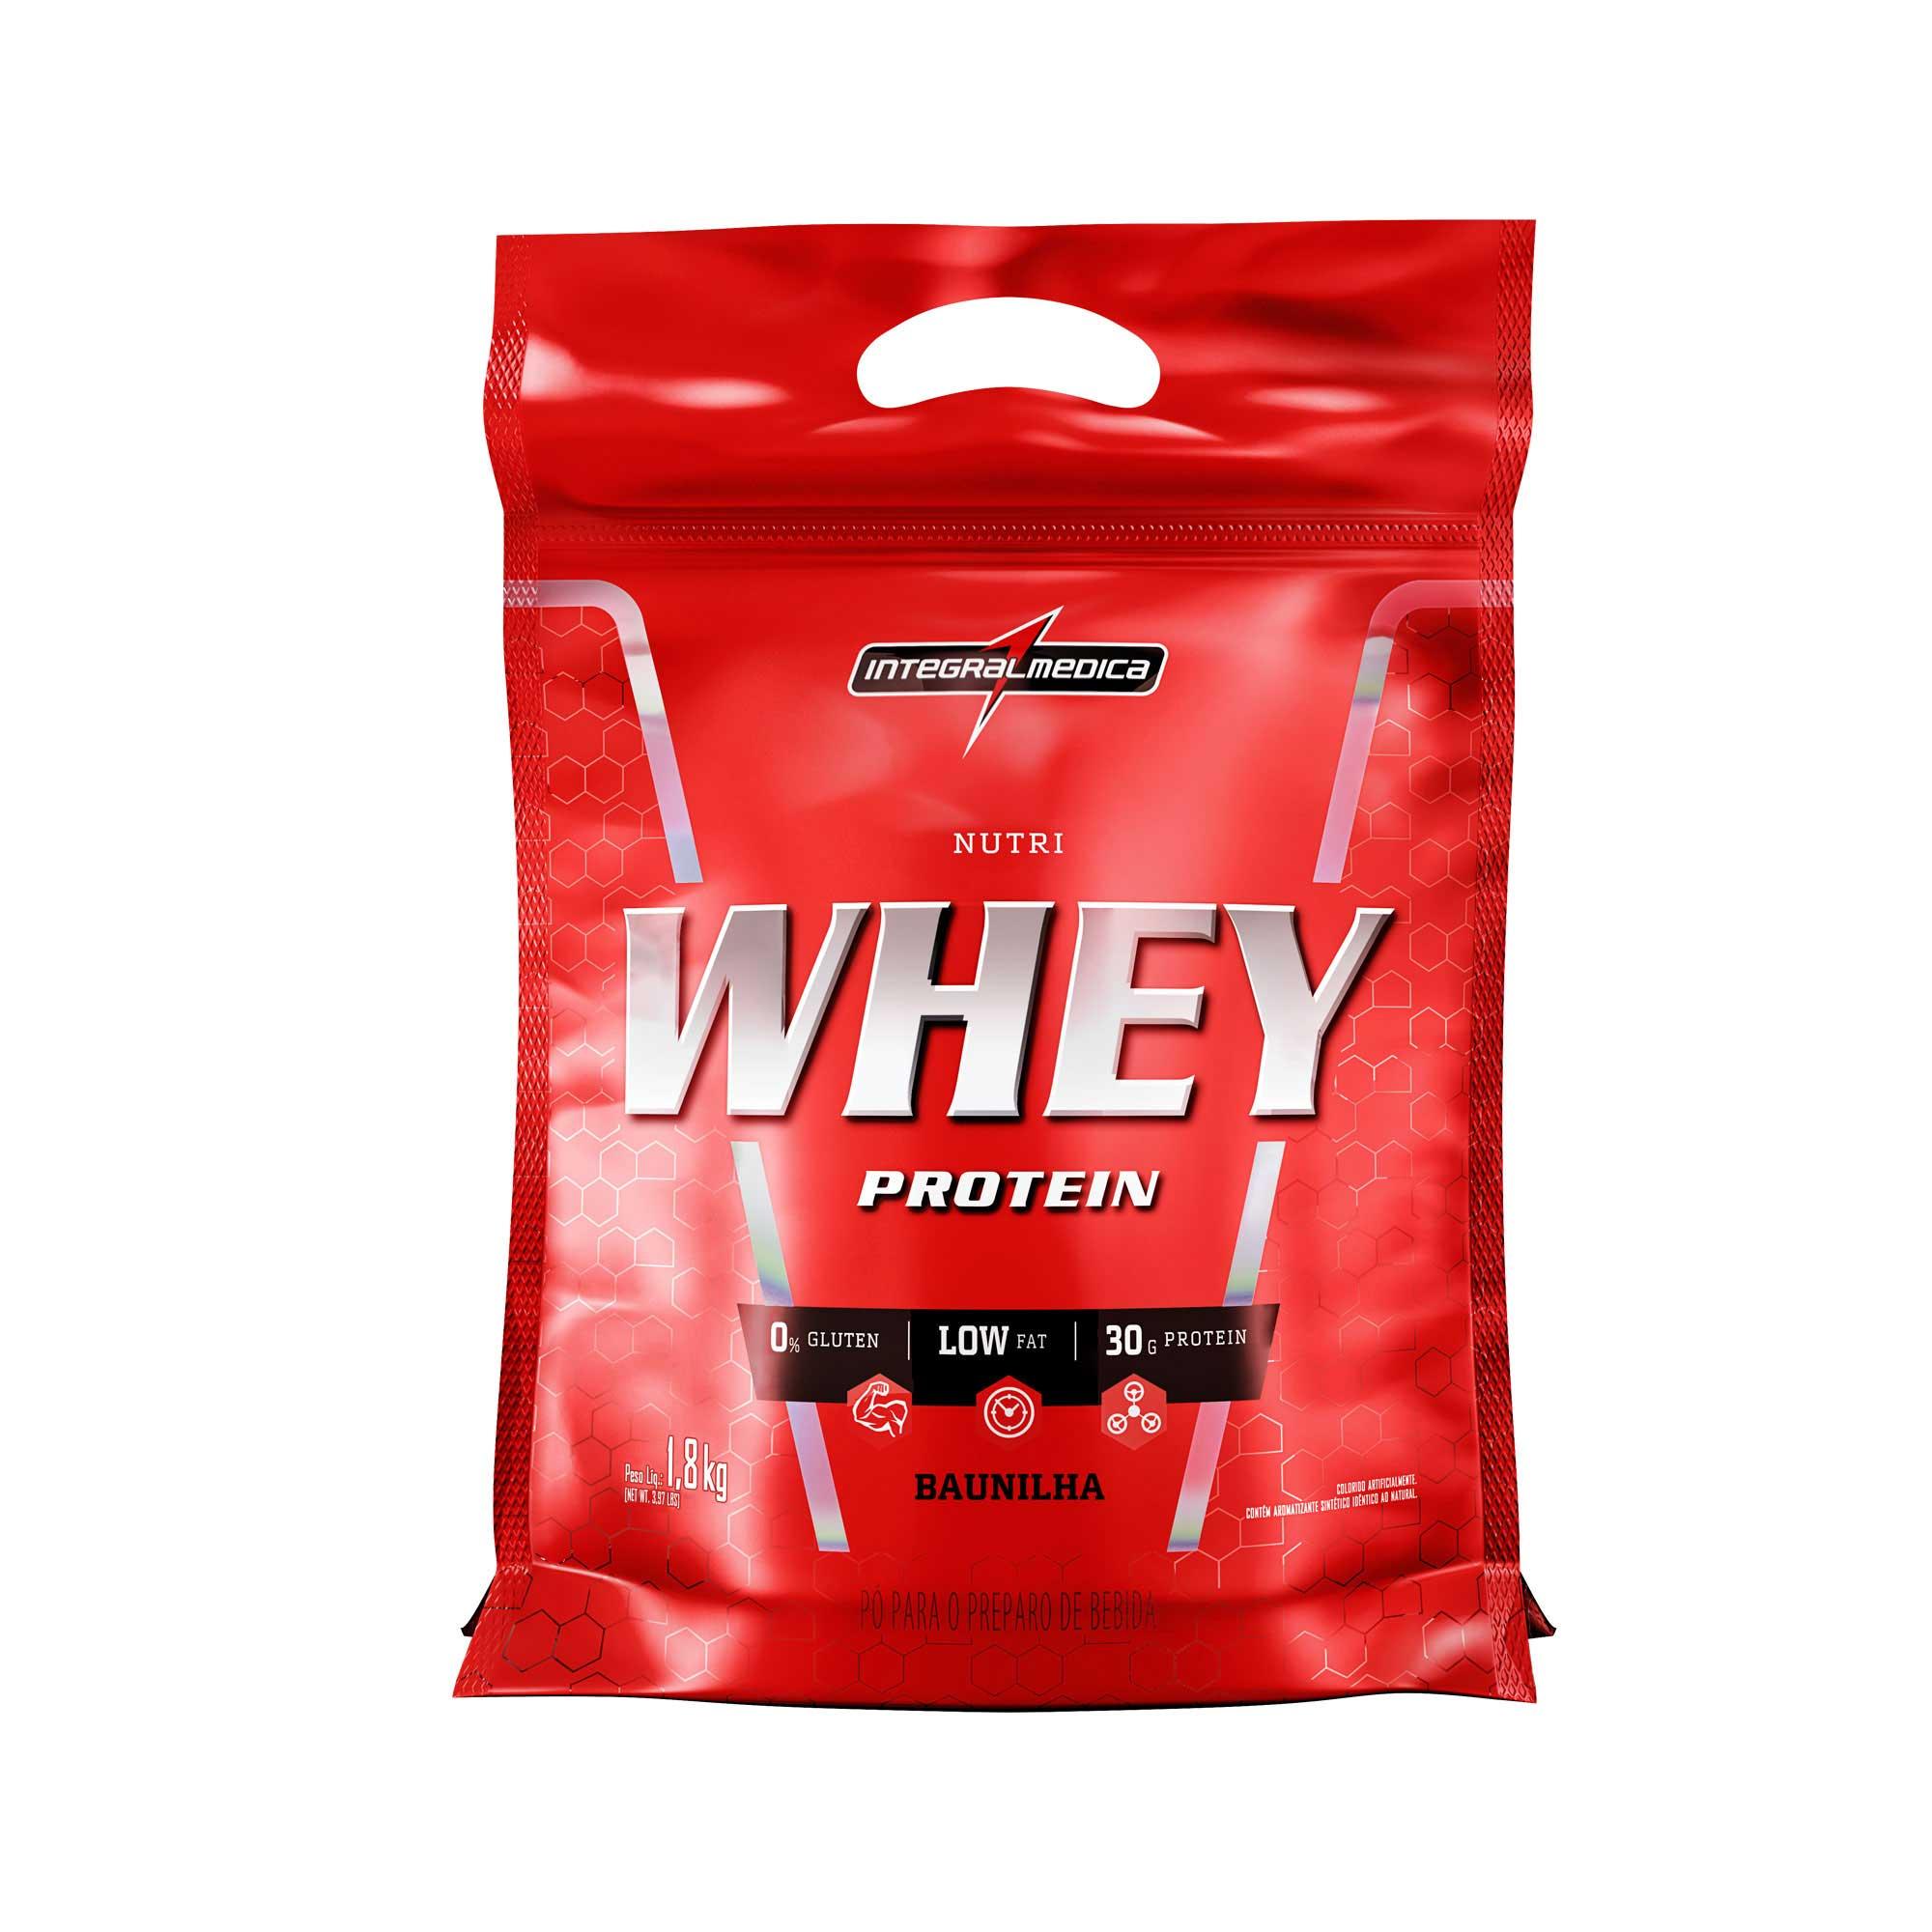 NutriWhey Protein Baunilha 1,8kg Integralmedica